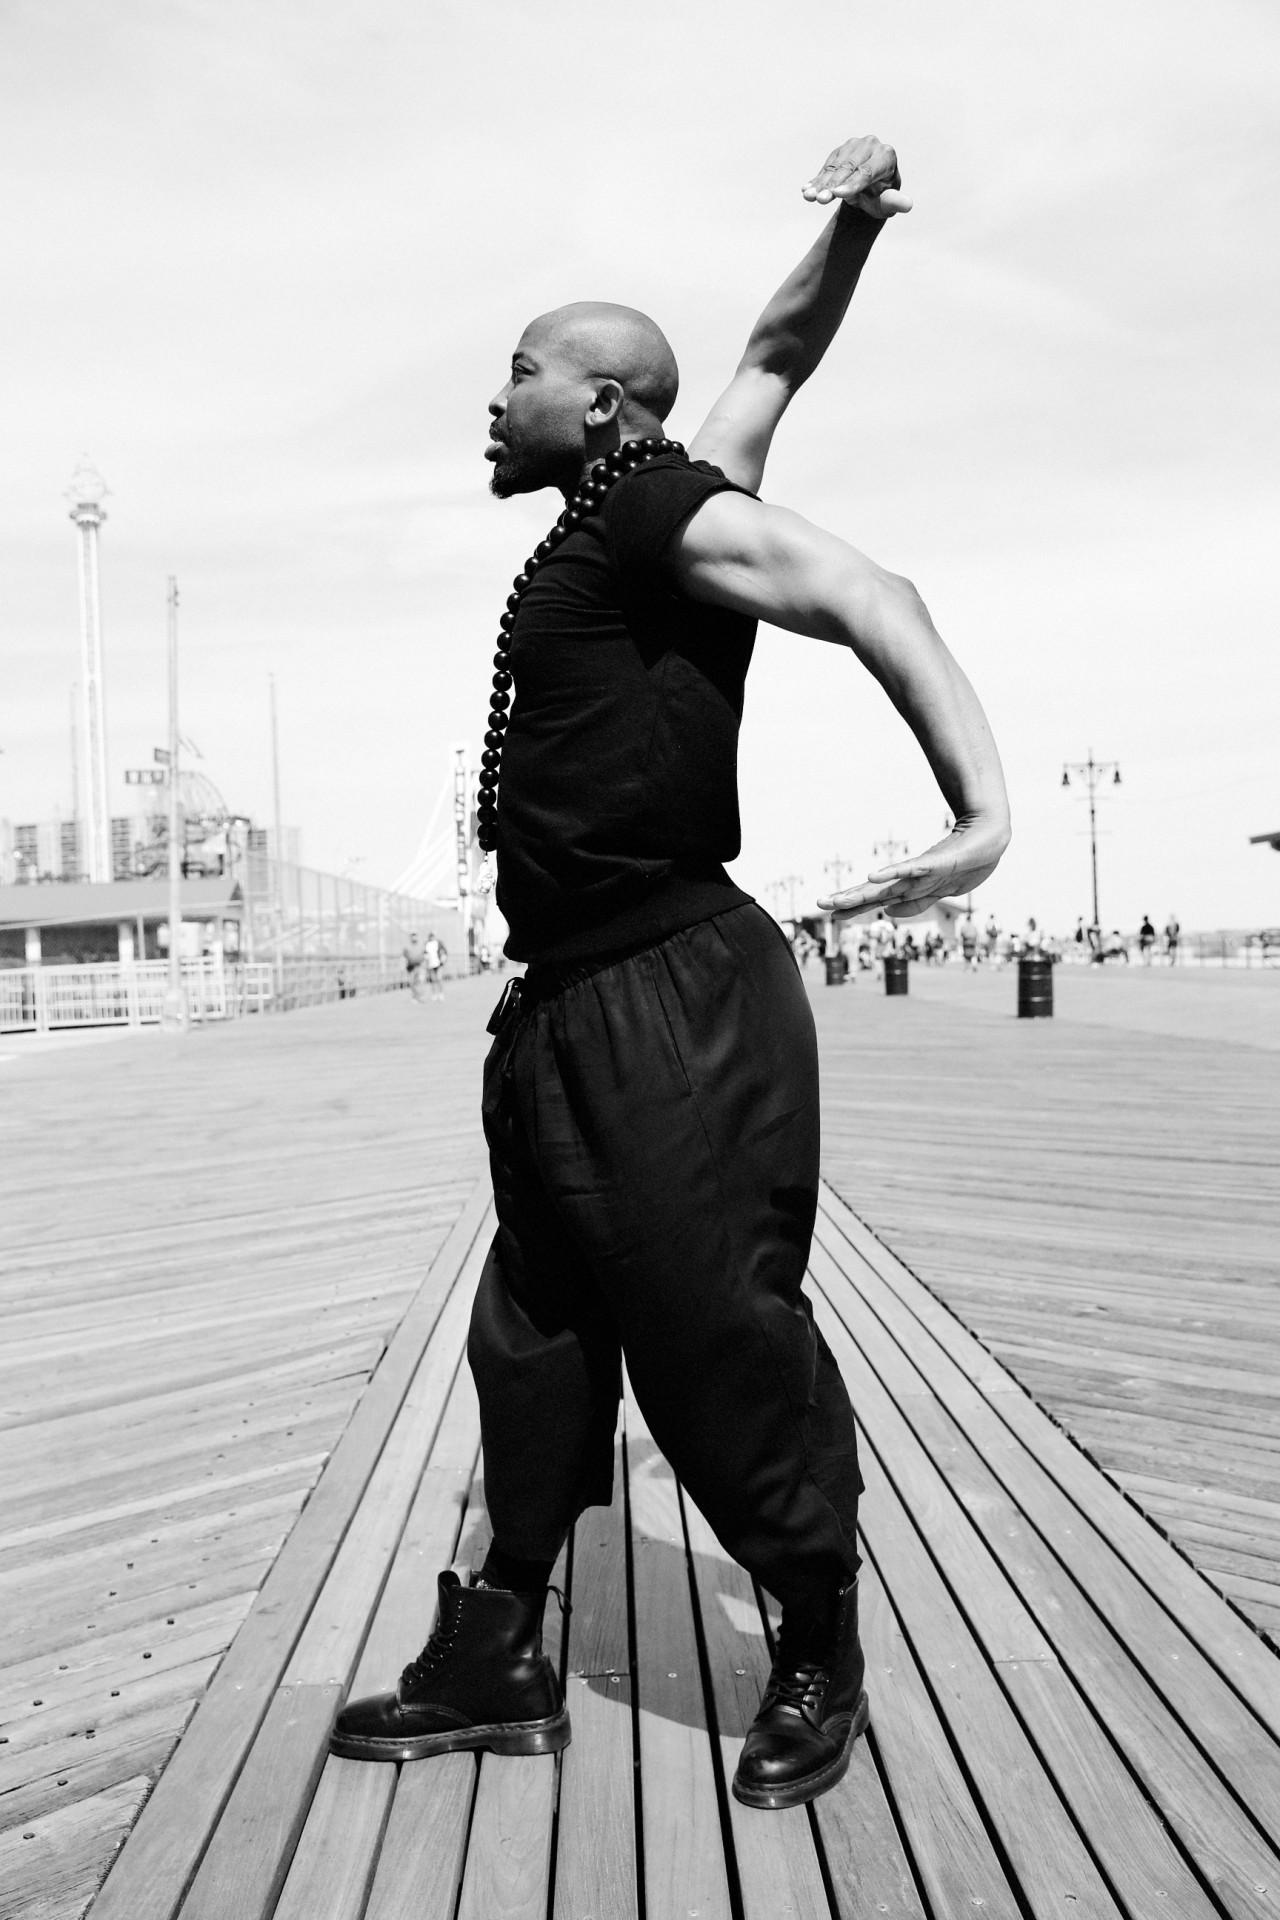 CAROLIN WINDEL Stanley Devaugn Milan, Coney Island New York (more-click here)